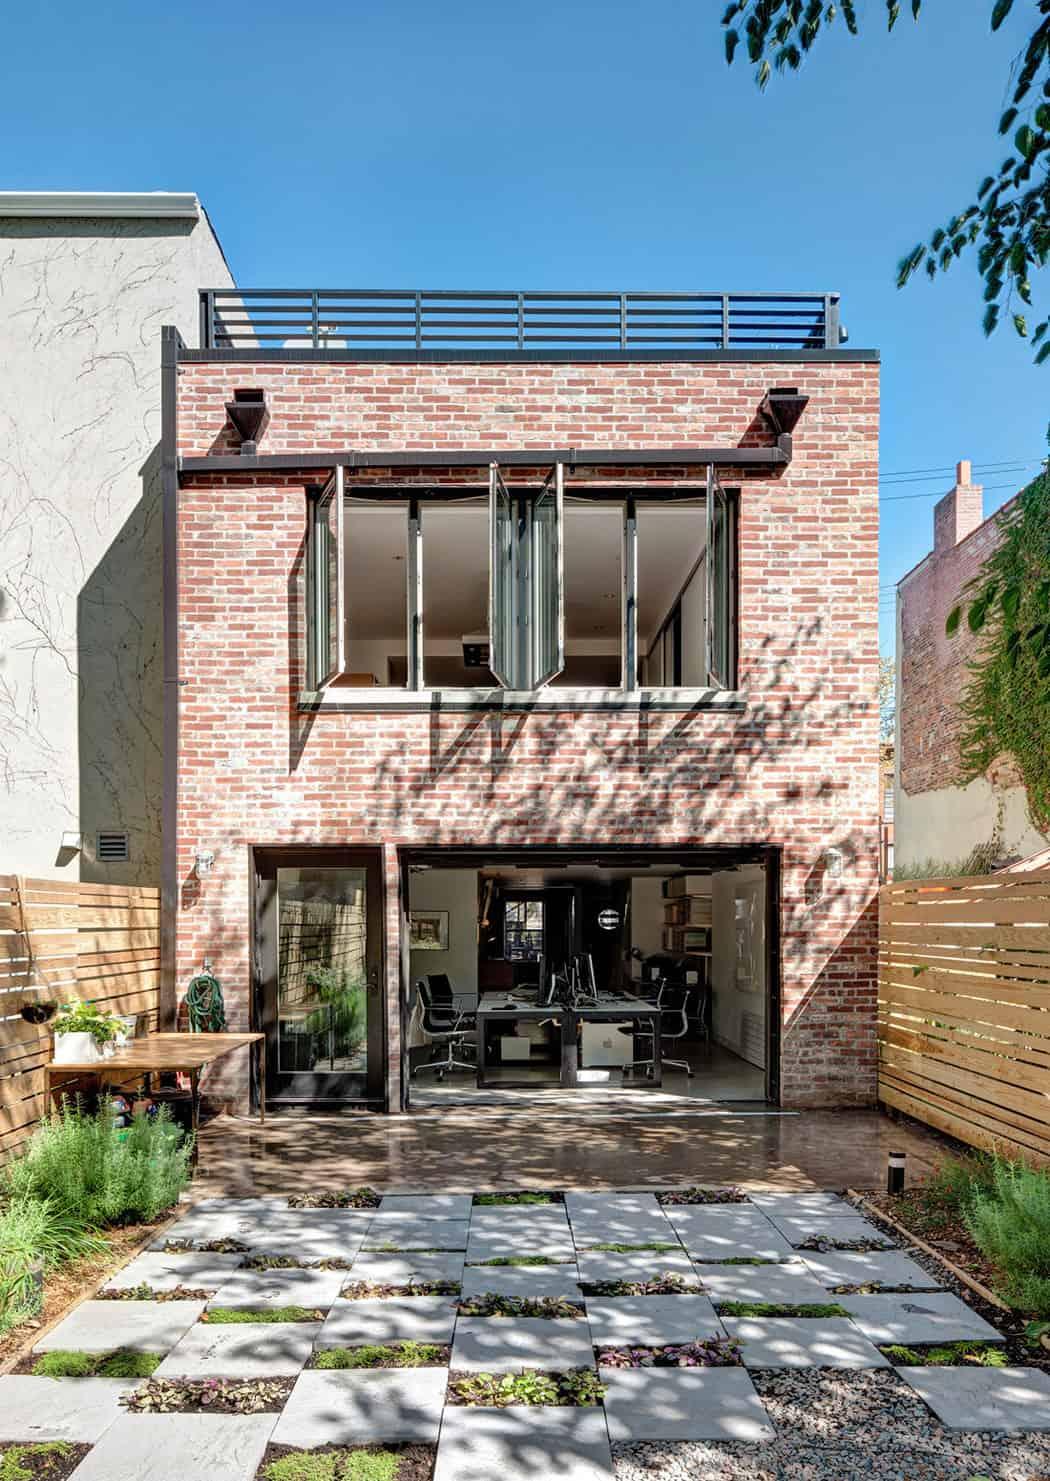 123 House by Gradient Design Studio (1)